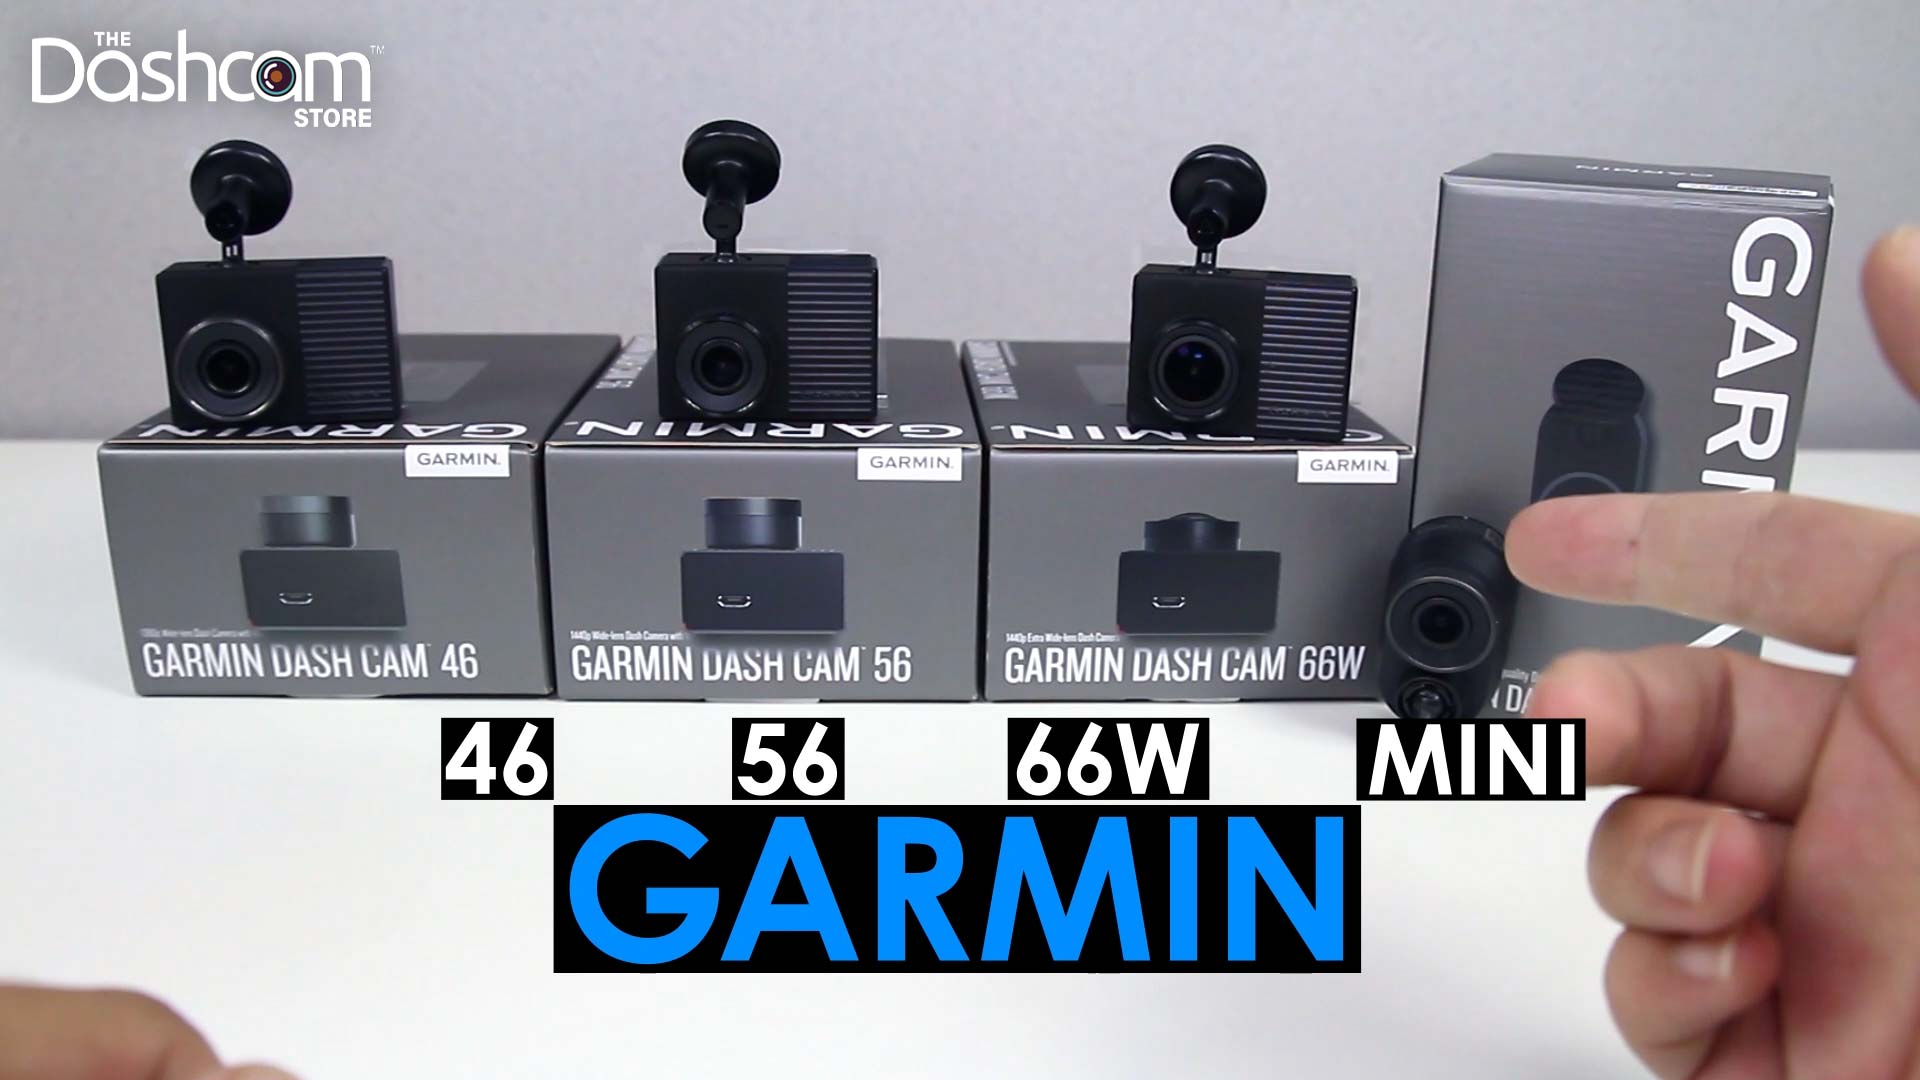 Unboxing the Garmin 46, 56, 66W, & Mini Dash Cams - The